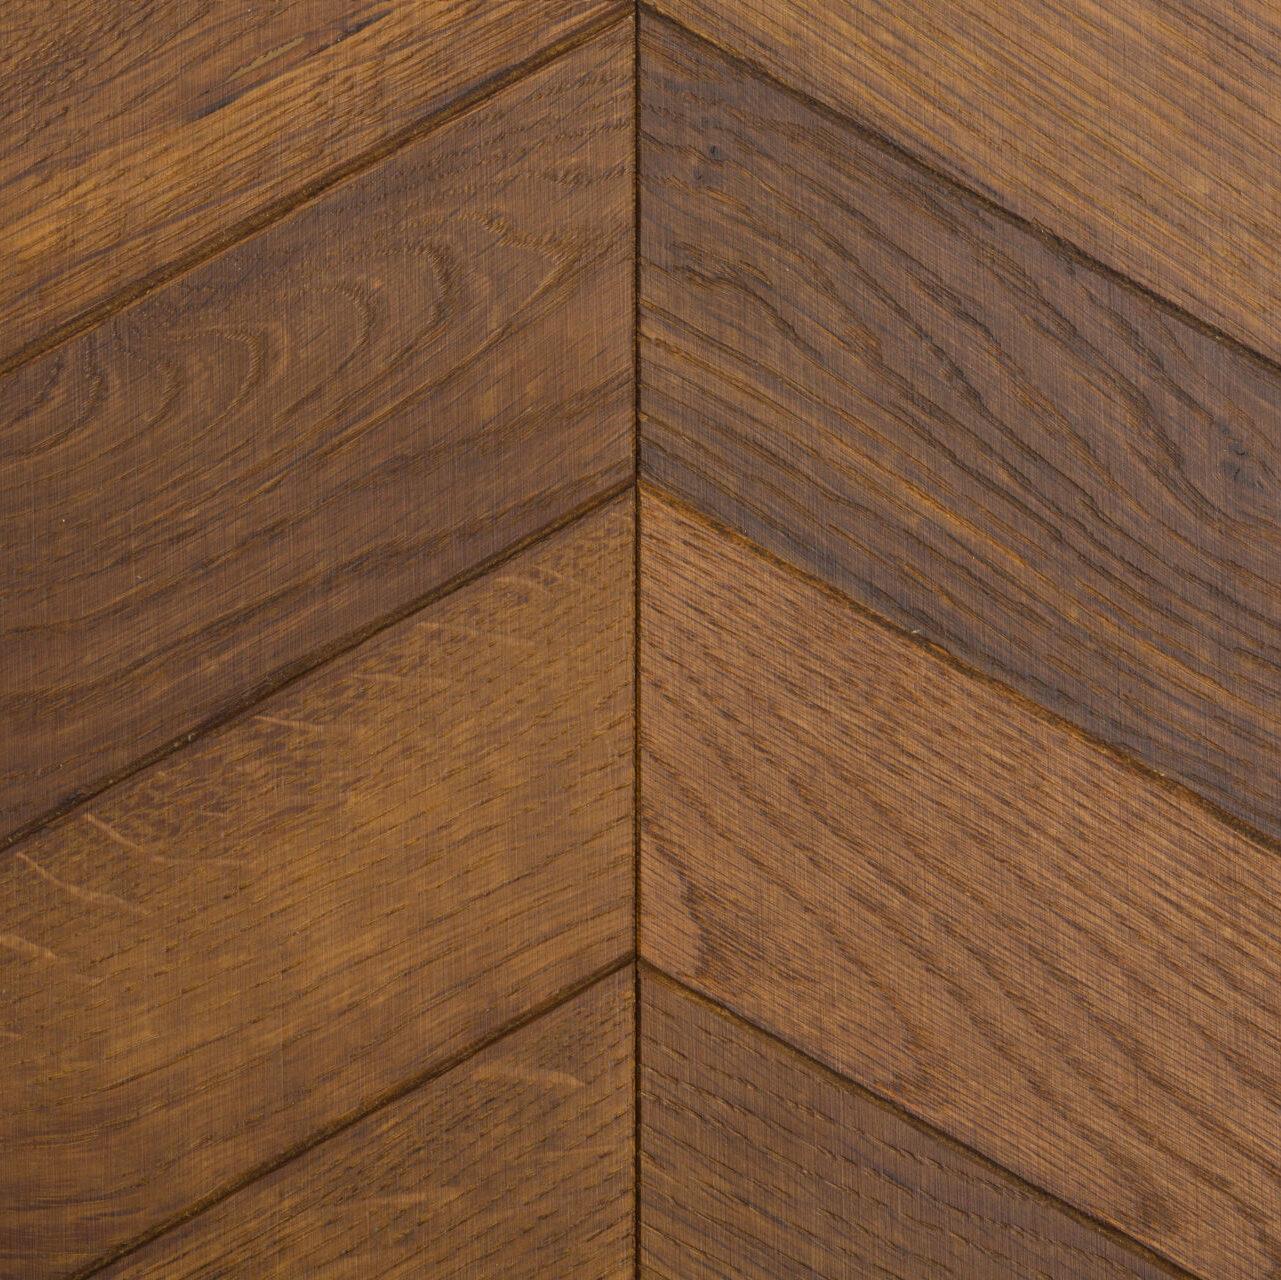 Wood Parquet Flooring - Golden Oak Chevron